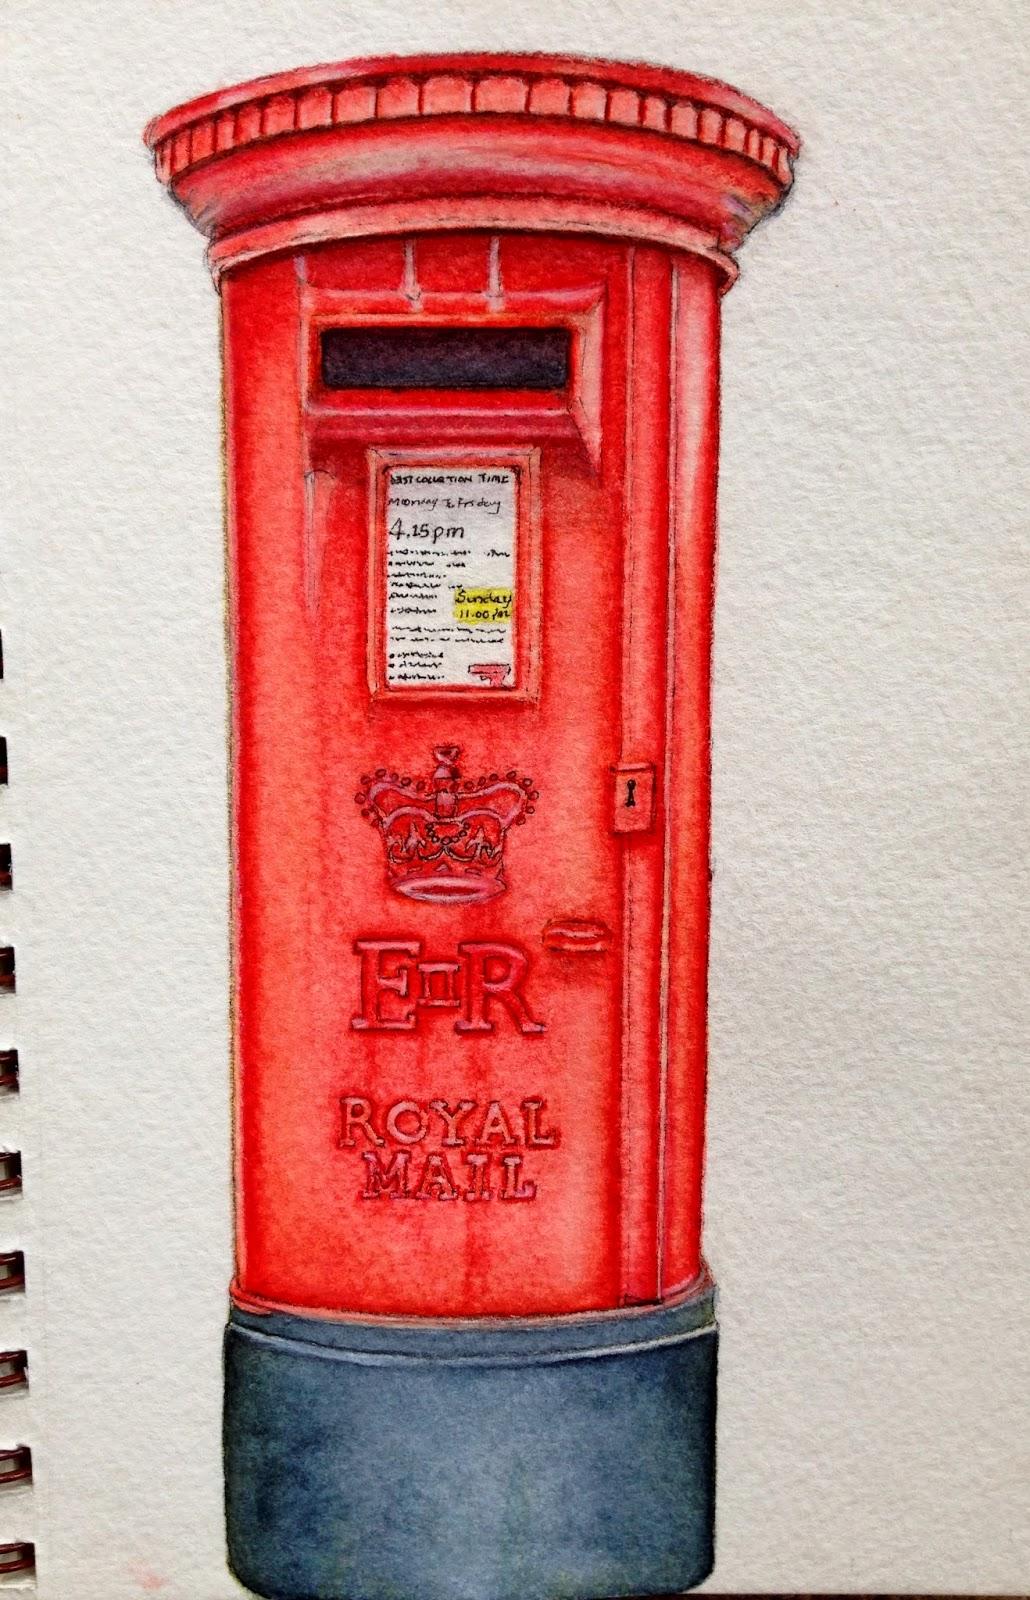 Artful Evidence Sketch - UK Post Box